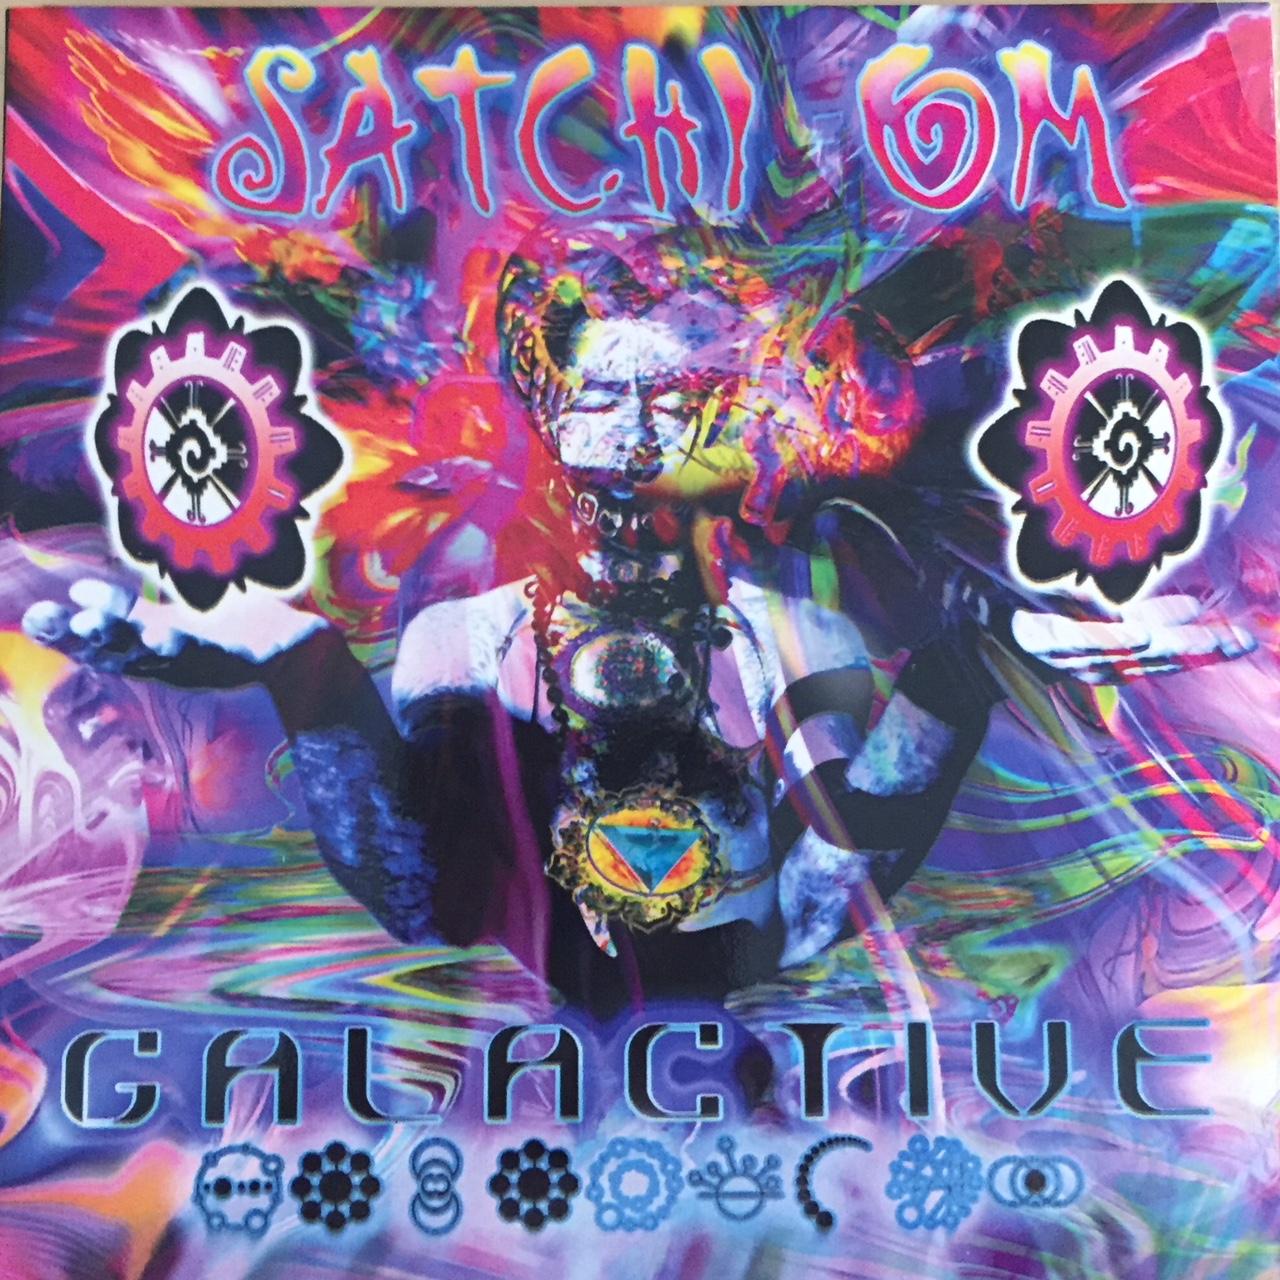 Satchi Om - Galactive